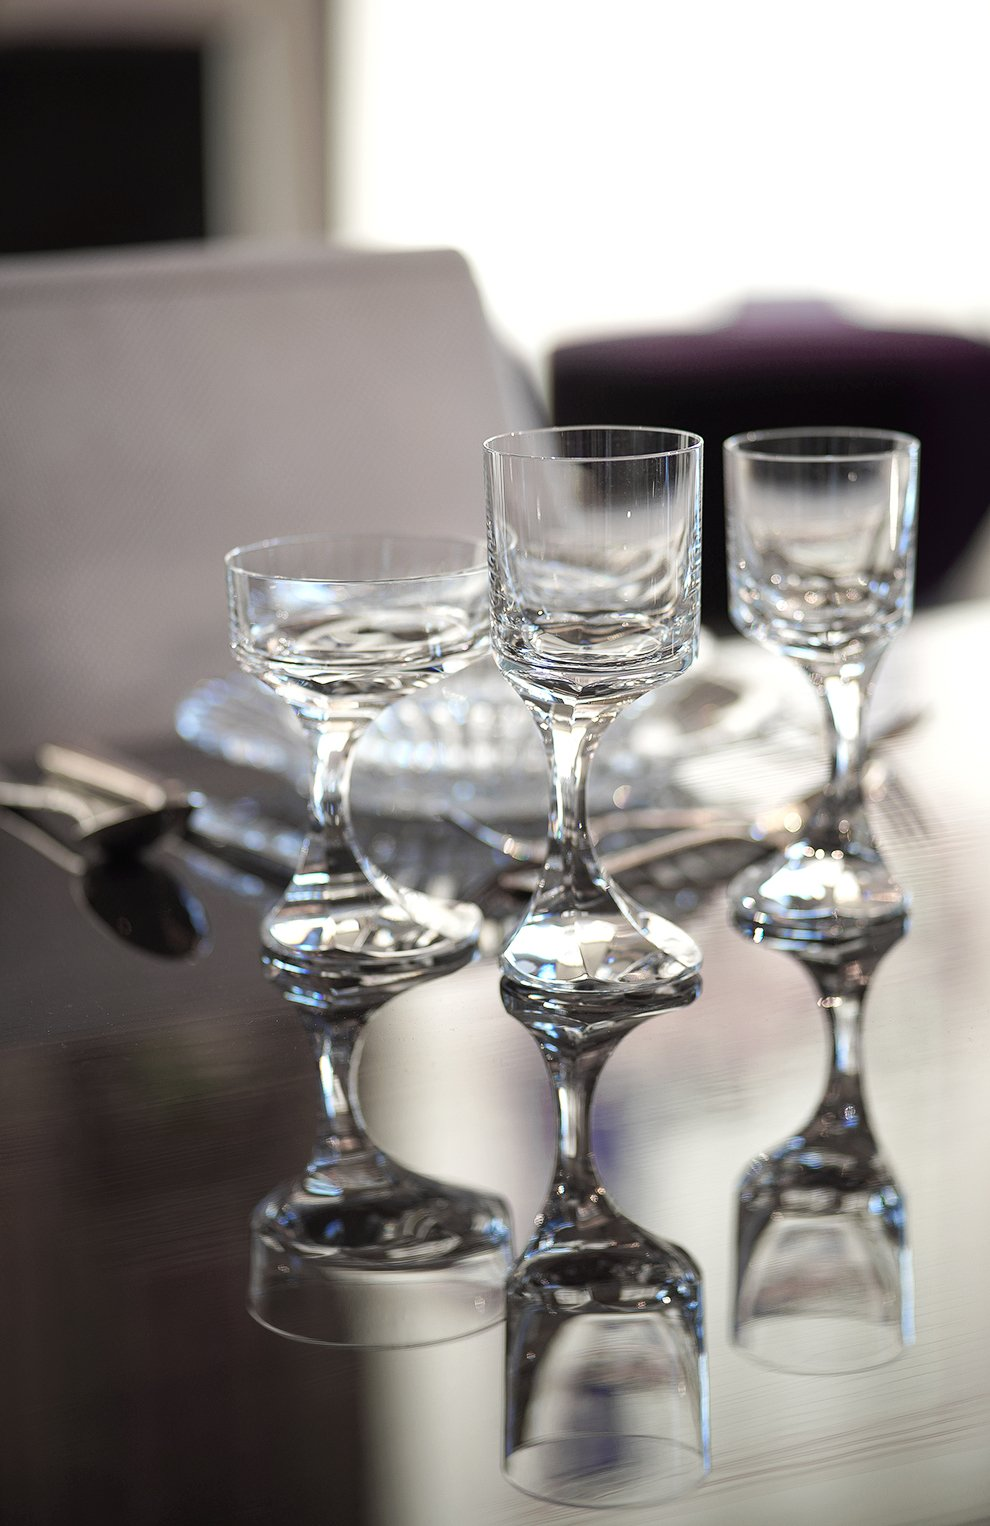 Набор из 2-х бокалов №2 Narcis | Фото №2